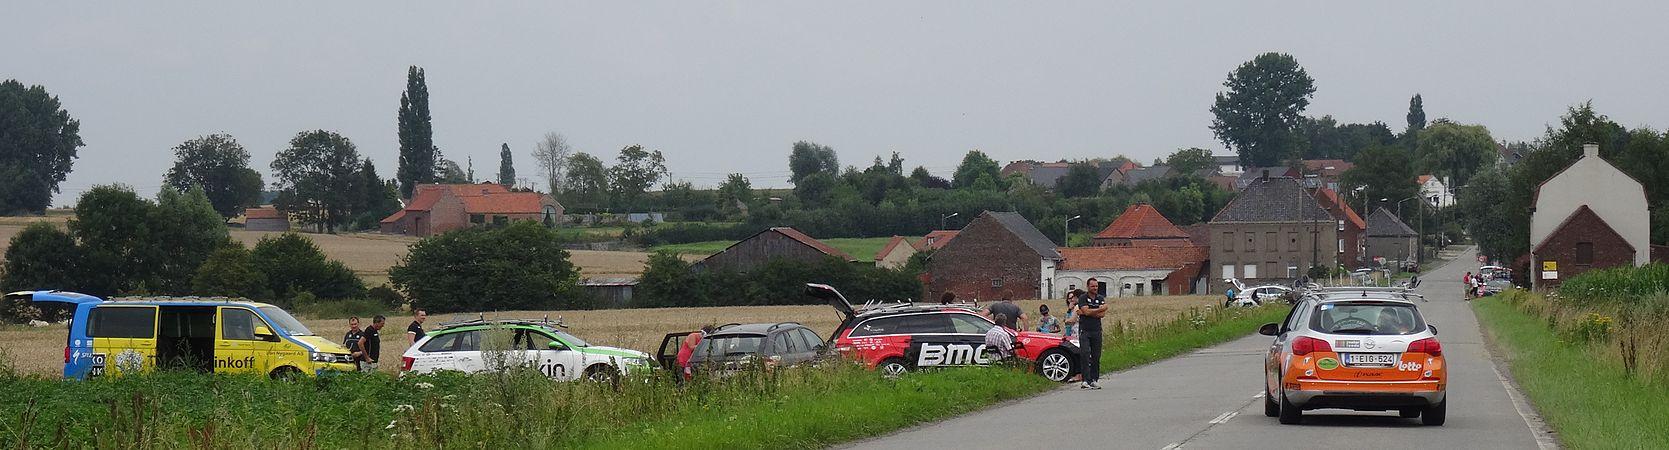 Rumillies (Tournai) - Tour de Wallonie, étape 1, 26 juillet 2014, ravitaillement (A06).JPG